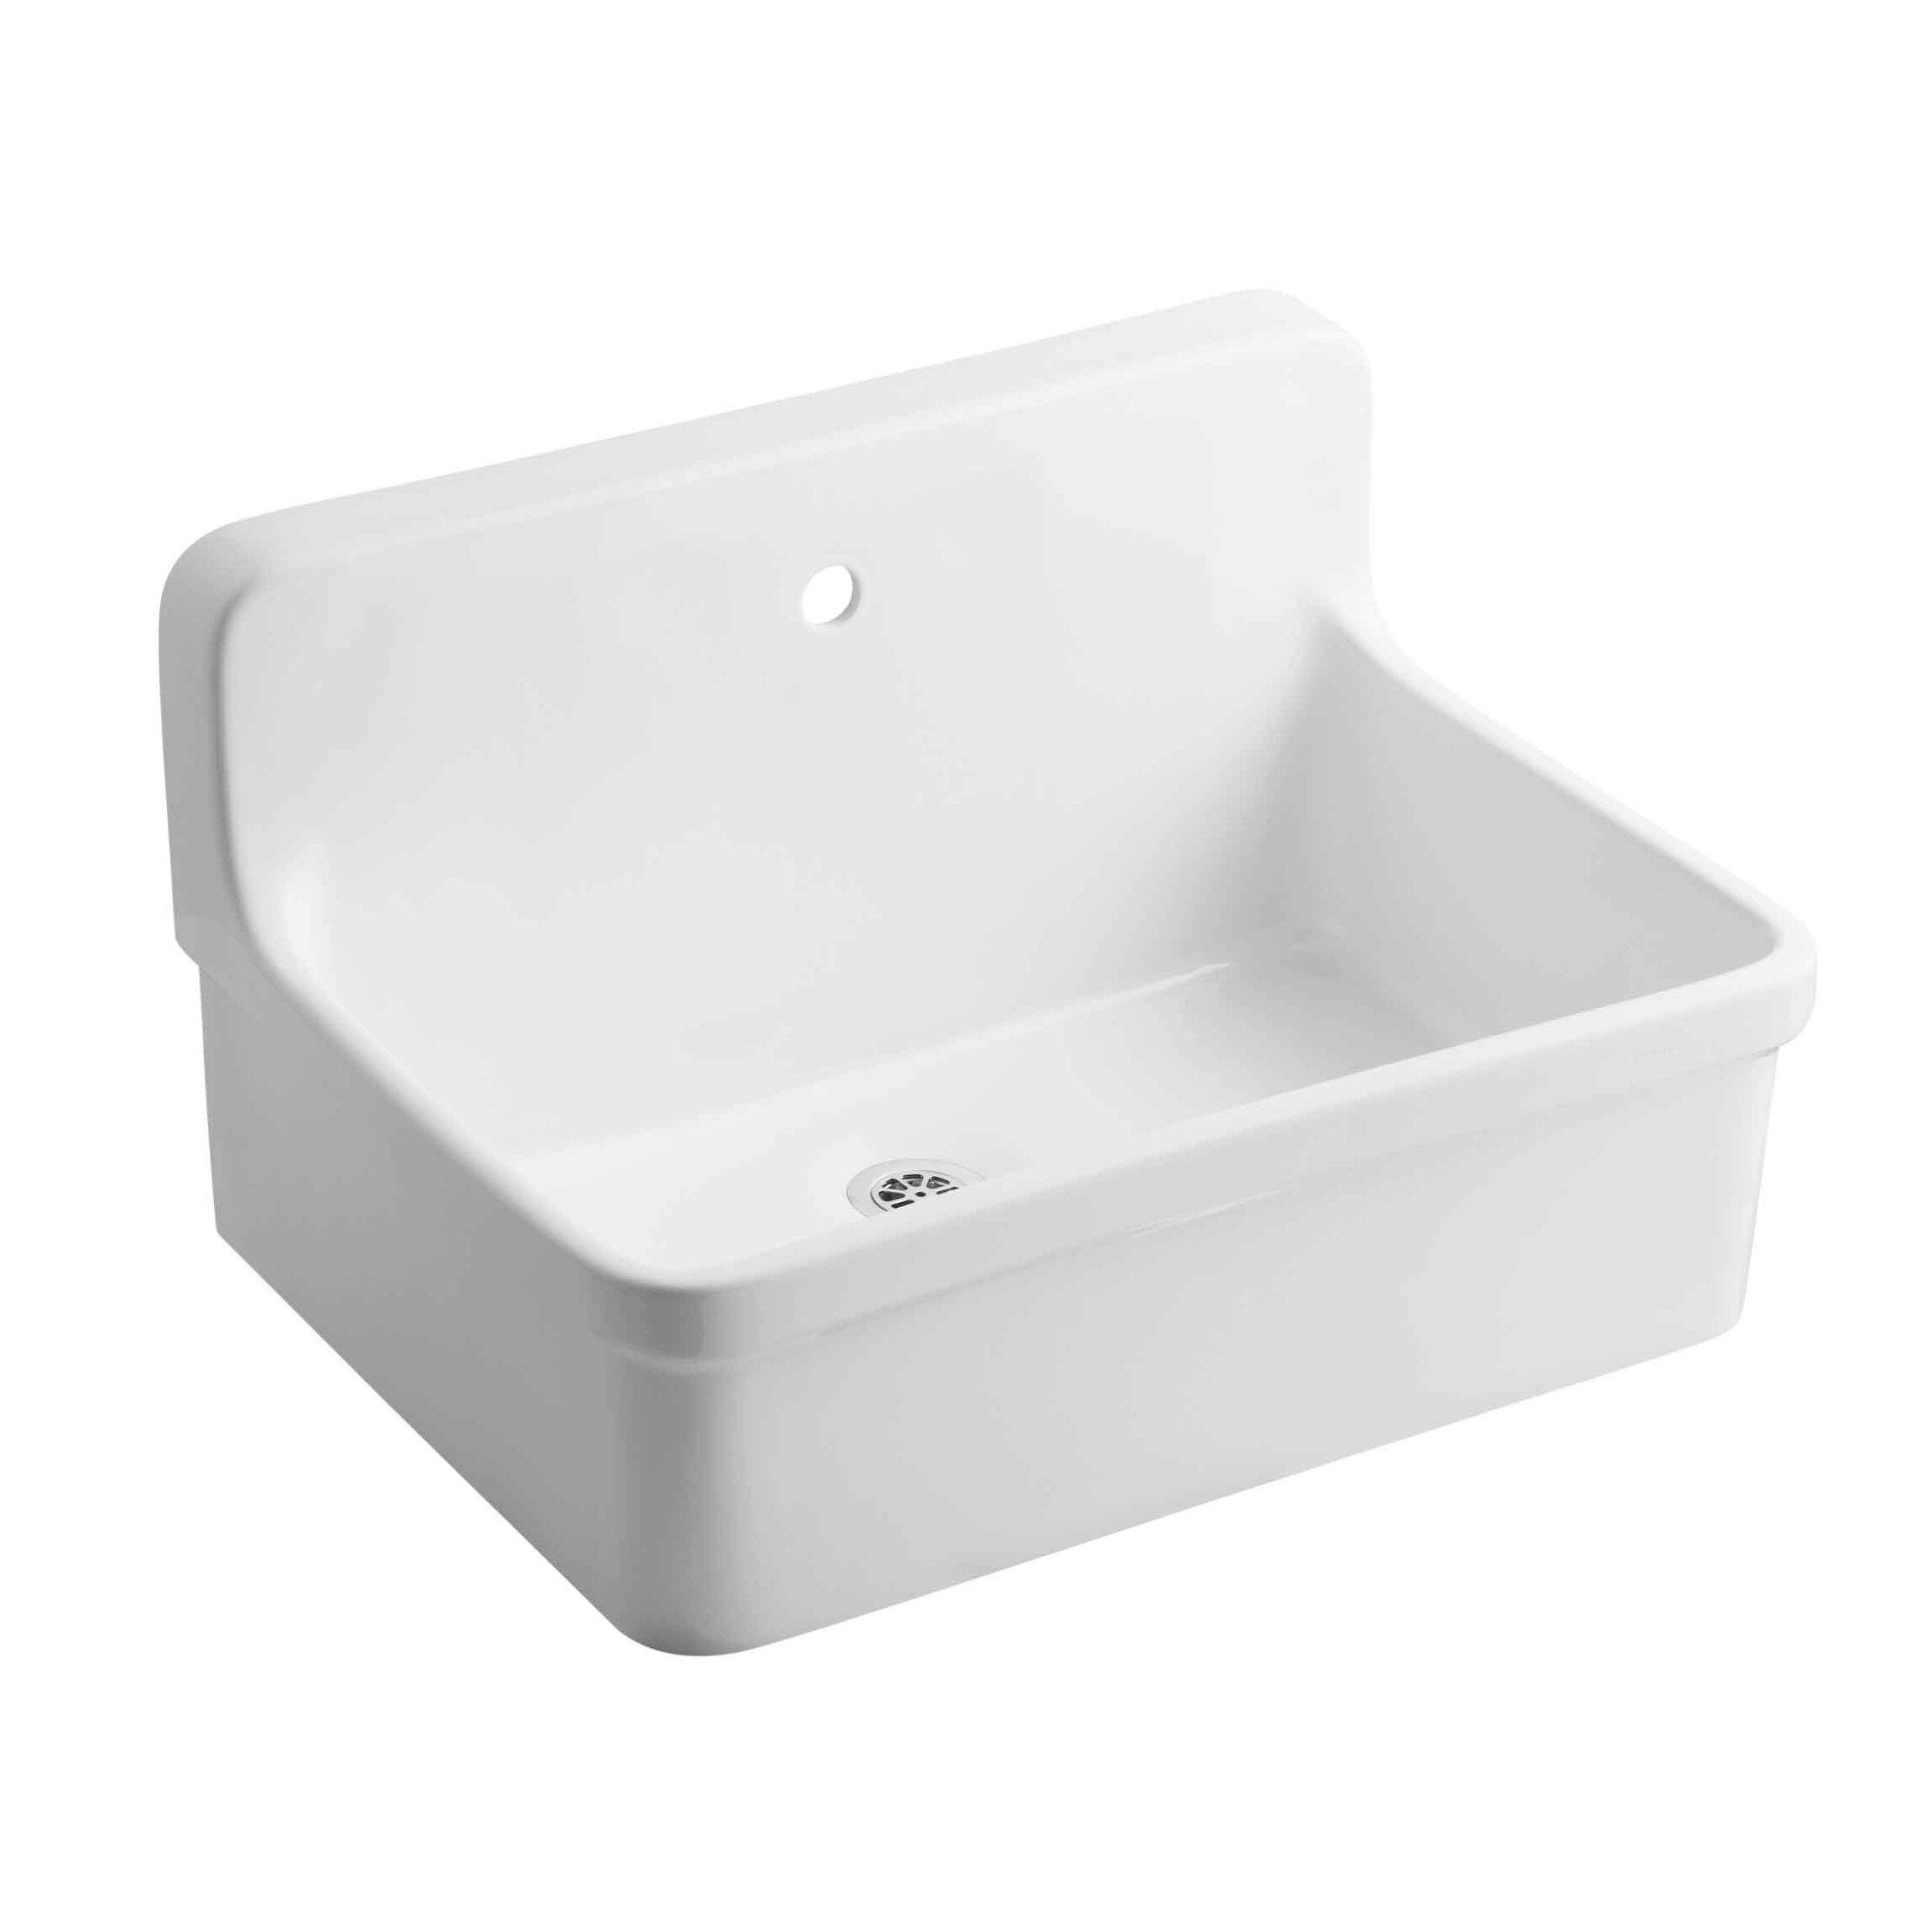 Kohler Gilford 30 X 22 Wall Mounted Laundry Sink Wayfair Ca